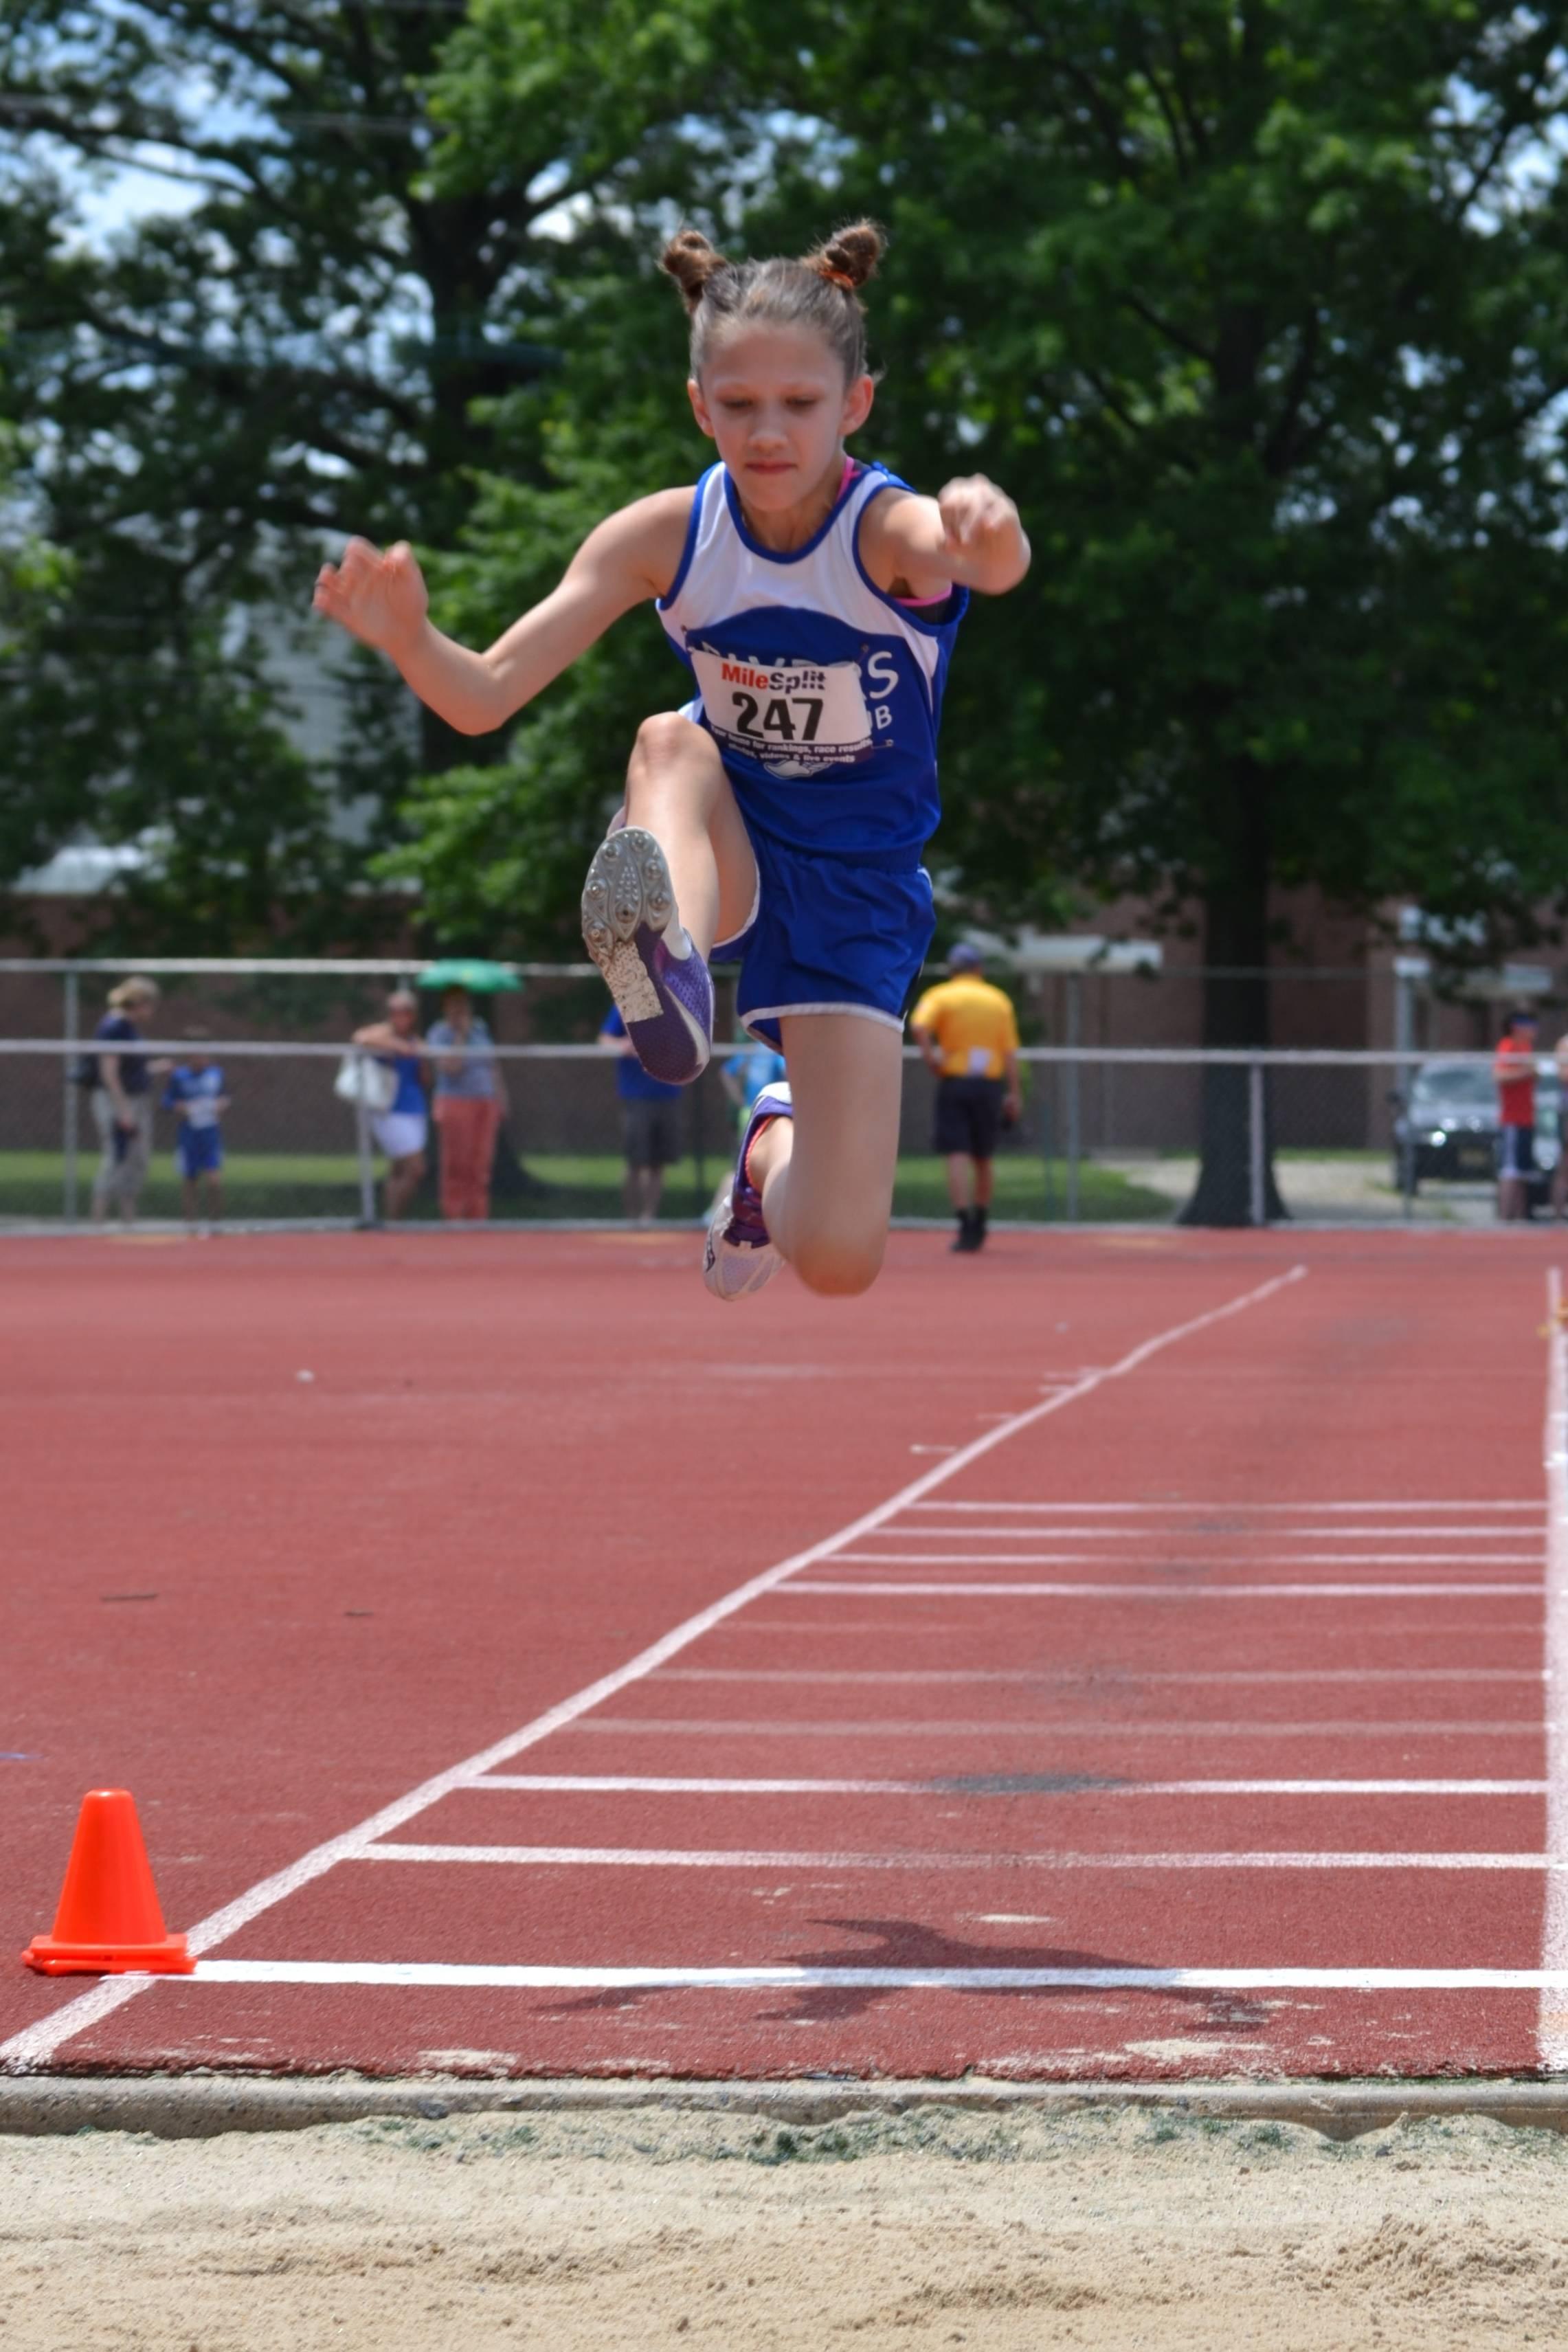 5988909c836d363f91a5_Emma_Muir_competes_in_Long_Jump.jpg